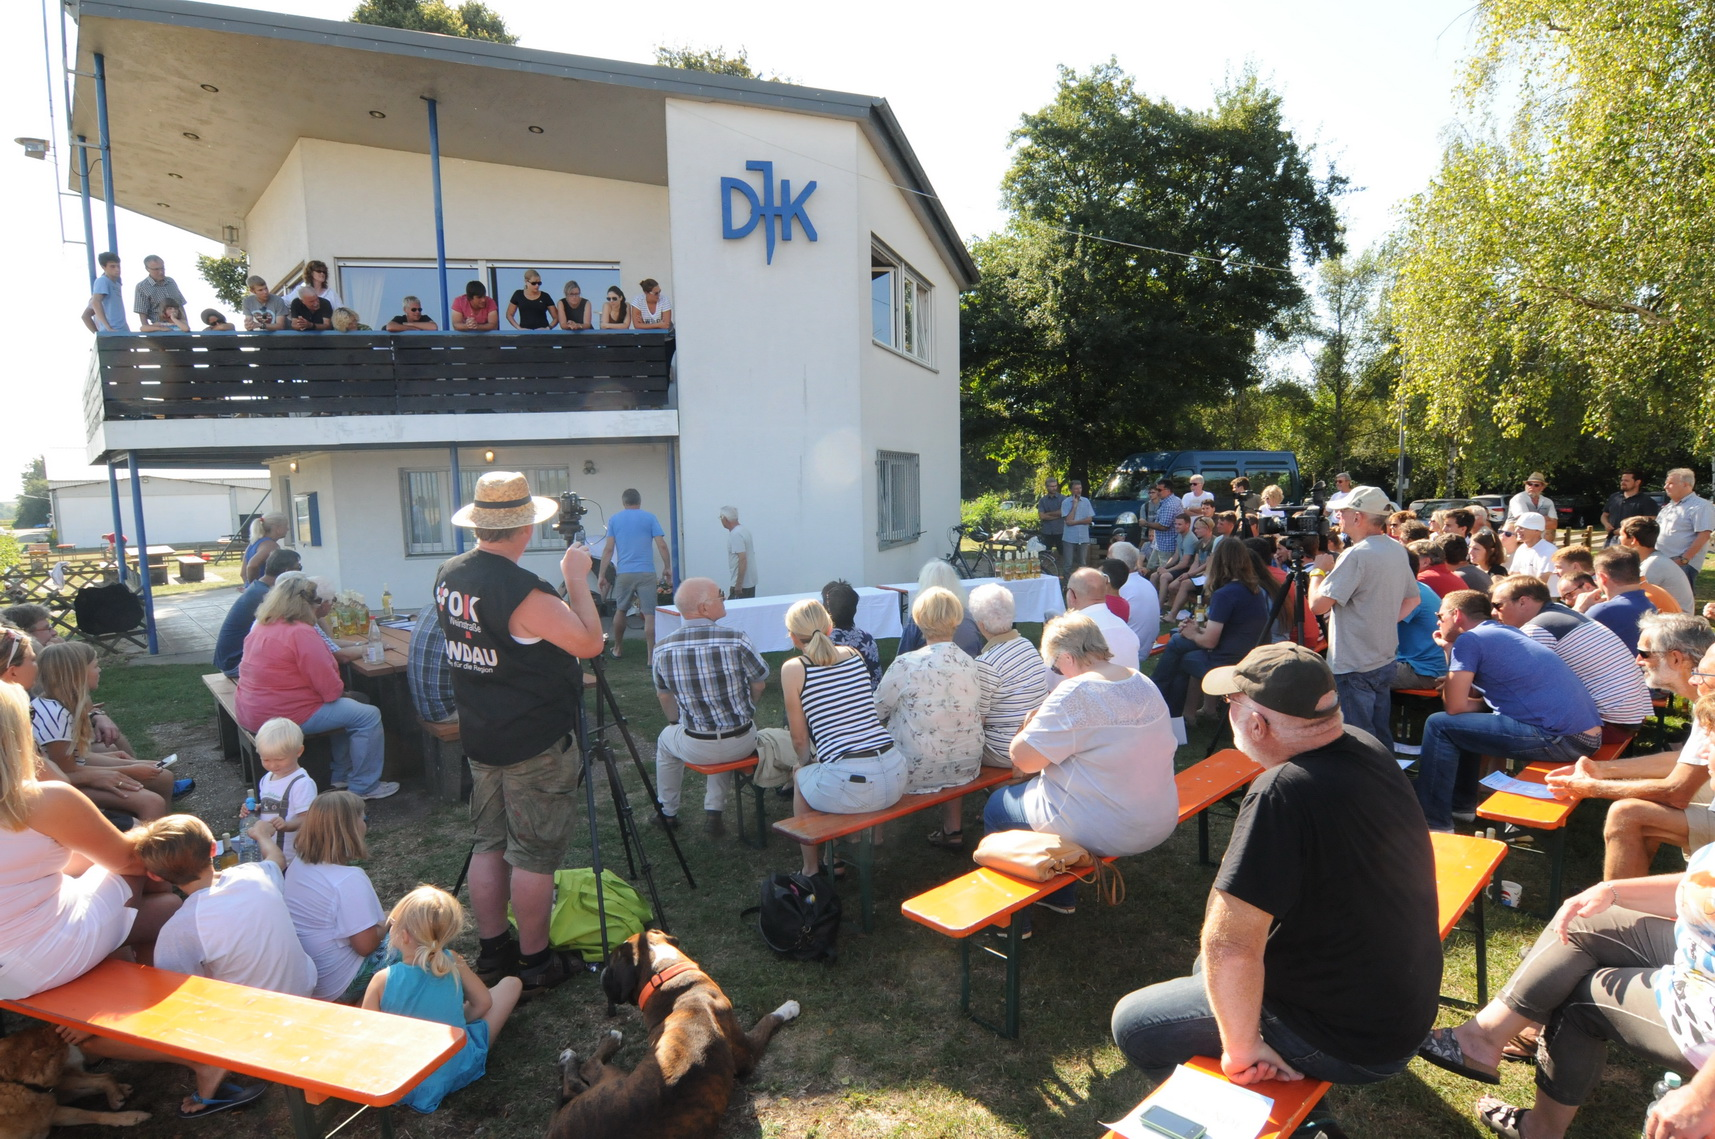 2016.08.28_RMO_0161_Suedwestdeutsche_Segelflugmeisterschaften_Bildgrosse_andern